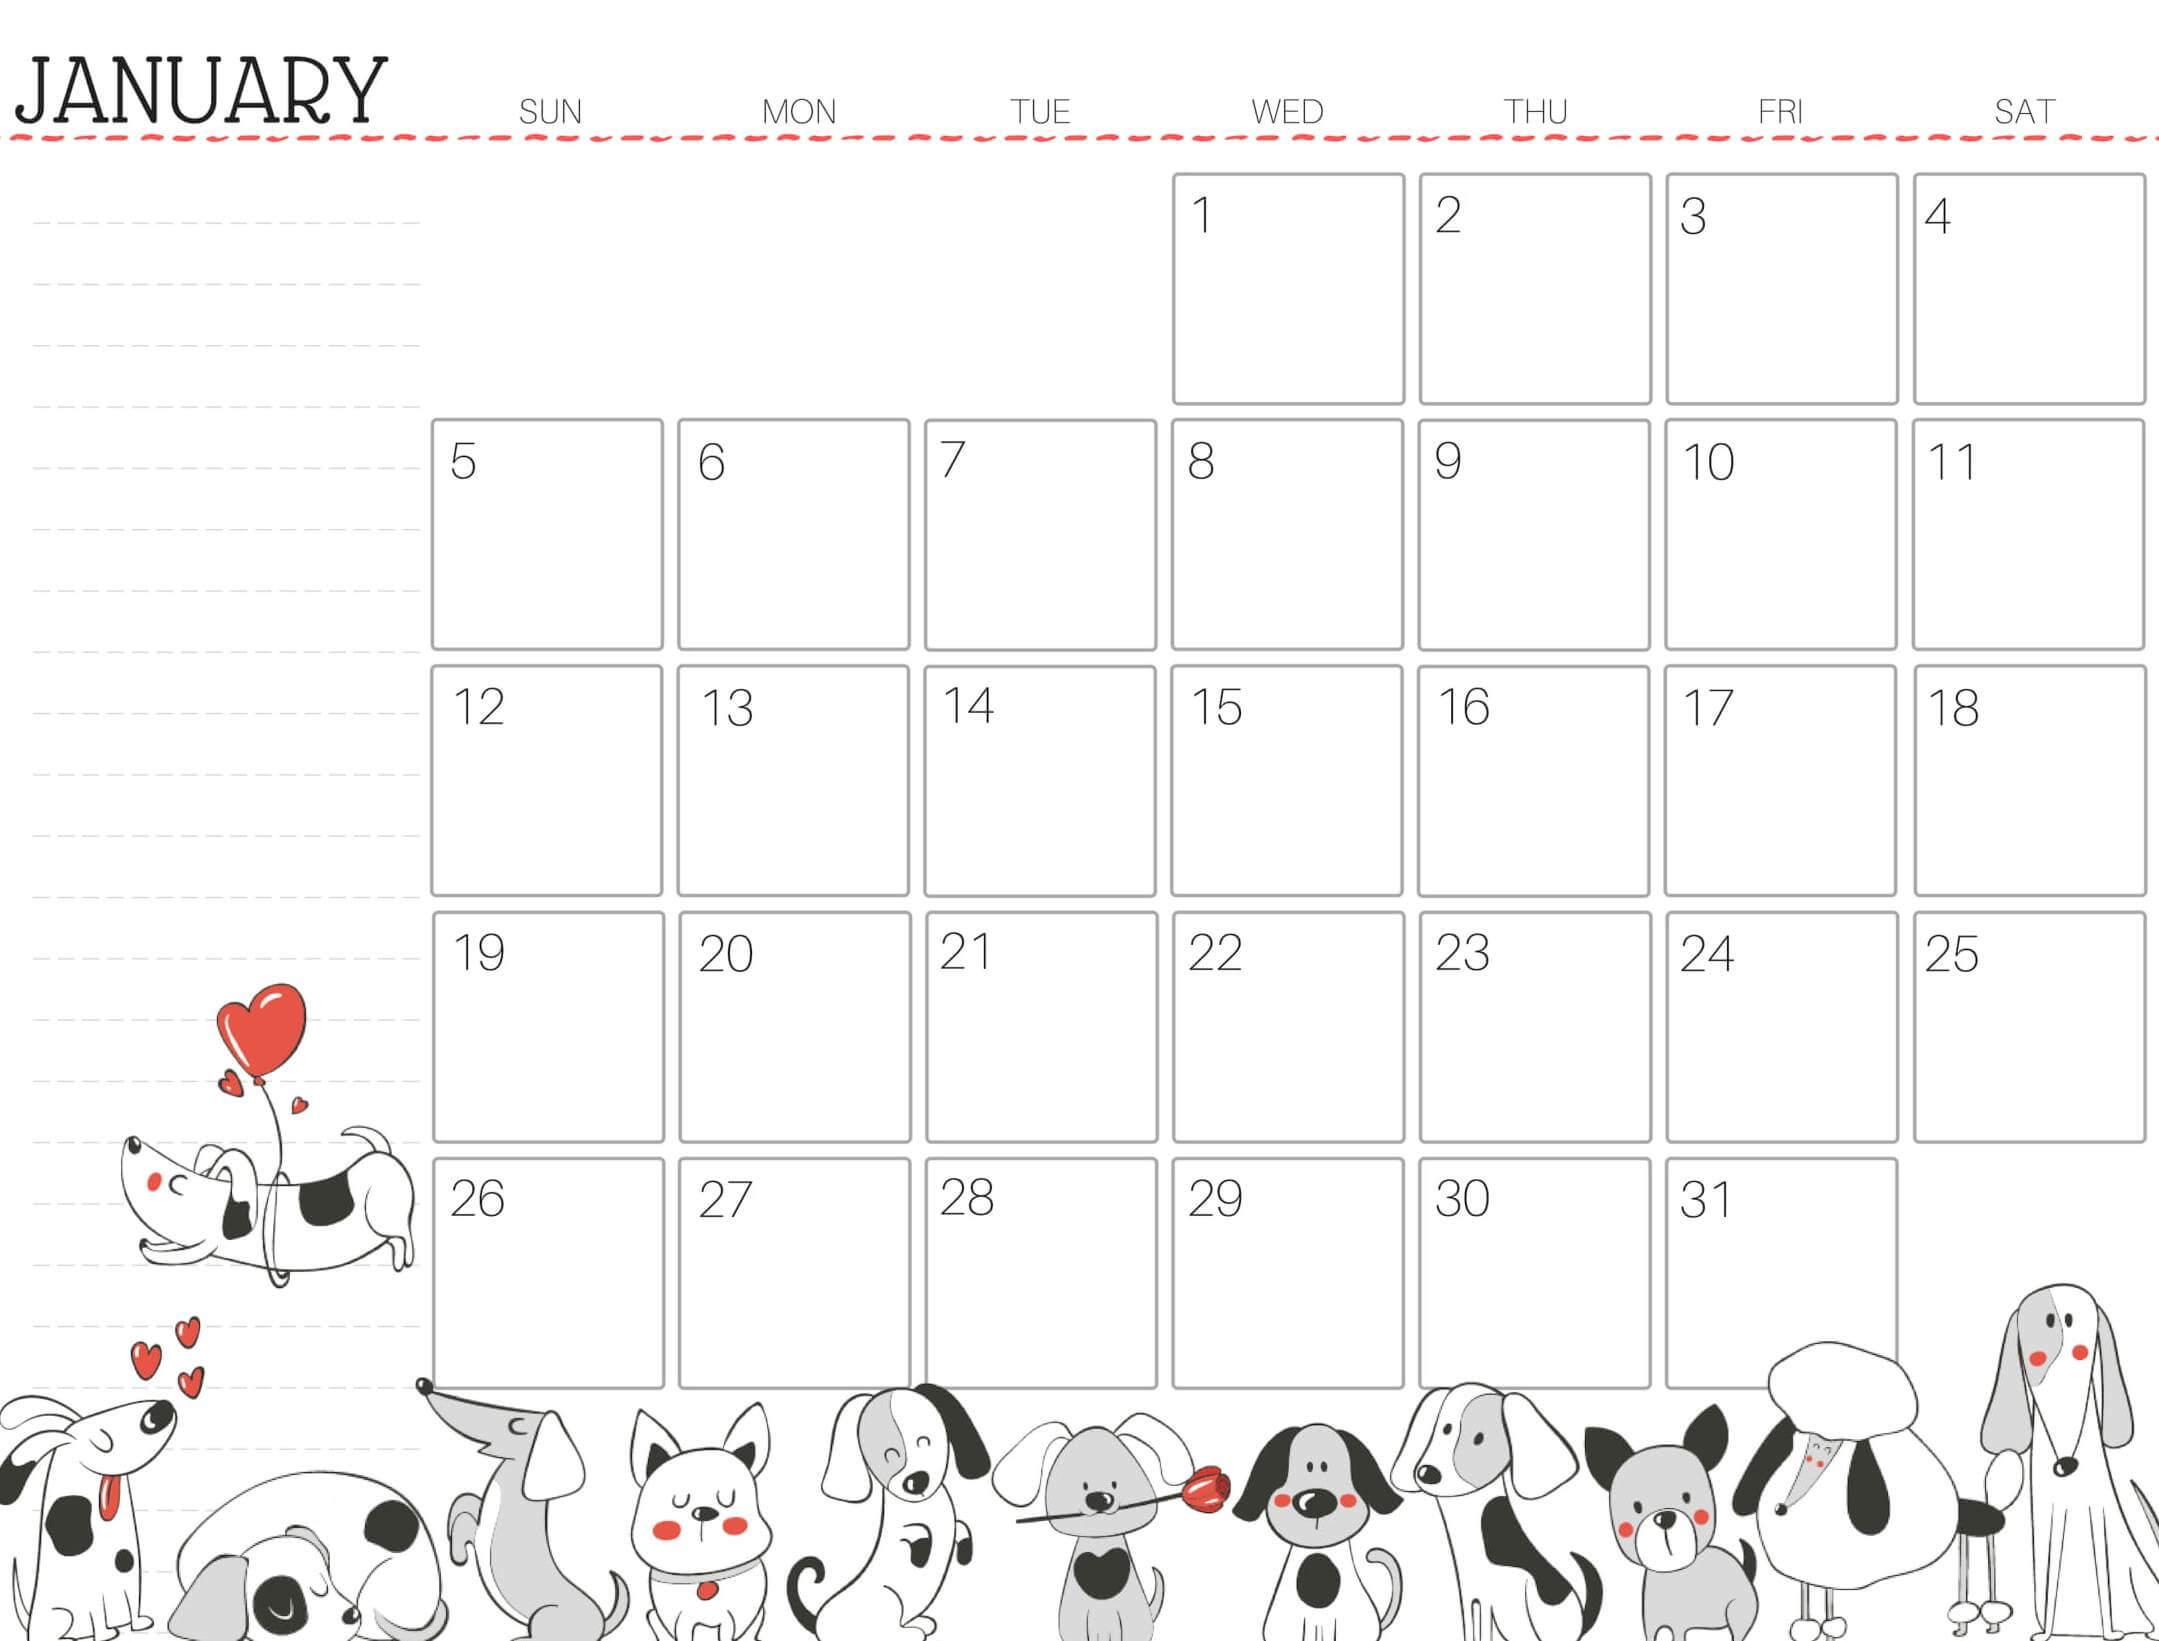 Cute January 2020 Calendar Design Printable Template - Set